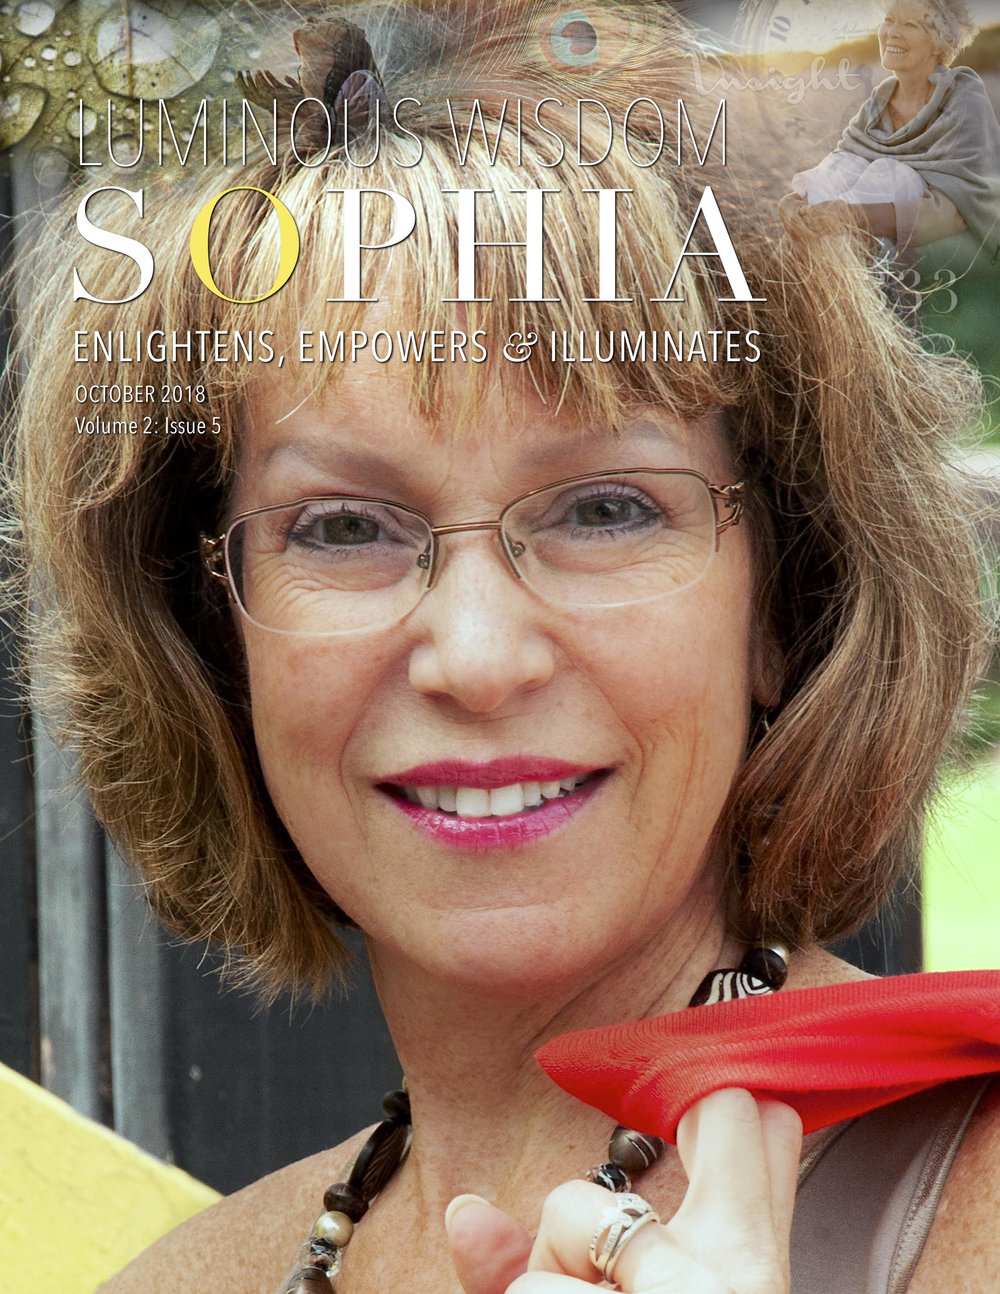 Me, on the cover Luminous Wisdom | Sophia. :) - 70,000+ readers